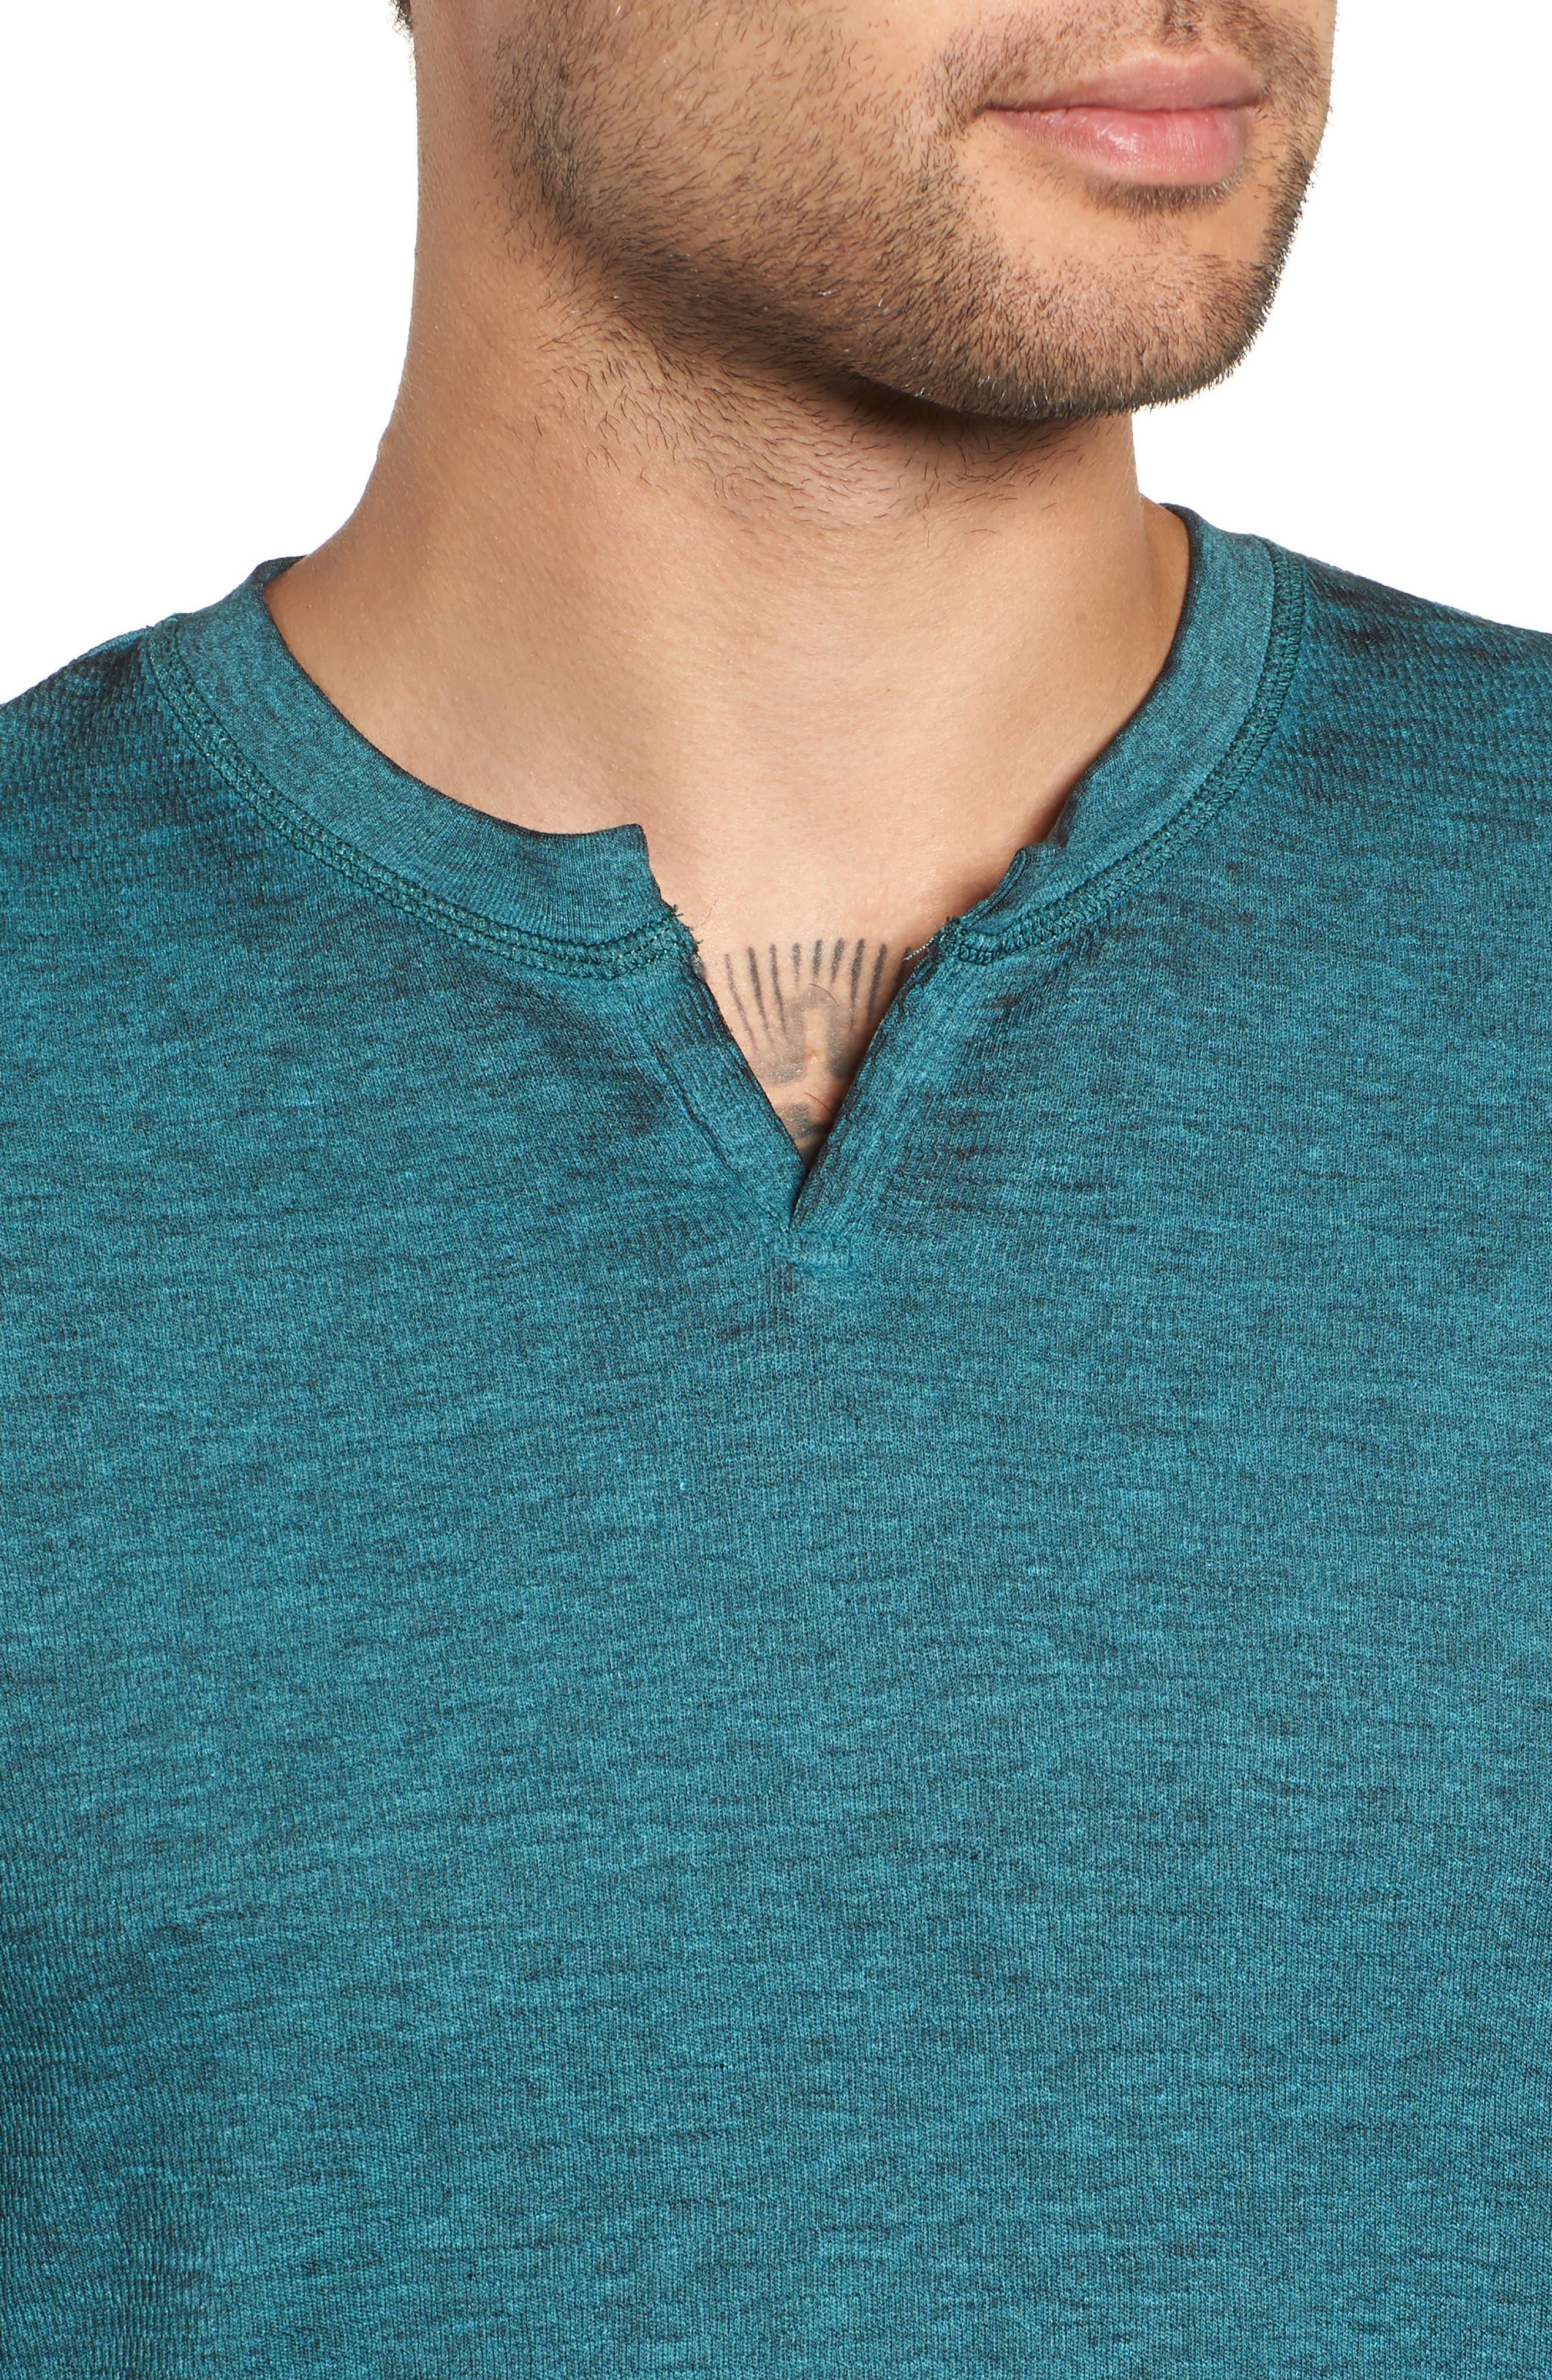 Notch Neck Thermal T-Shirt,                             Alternate thumbnail 27, color,